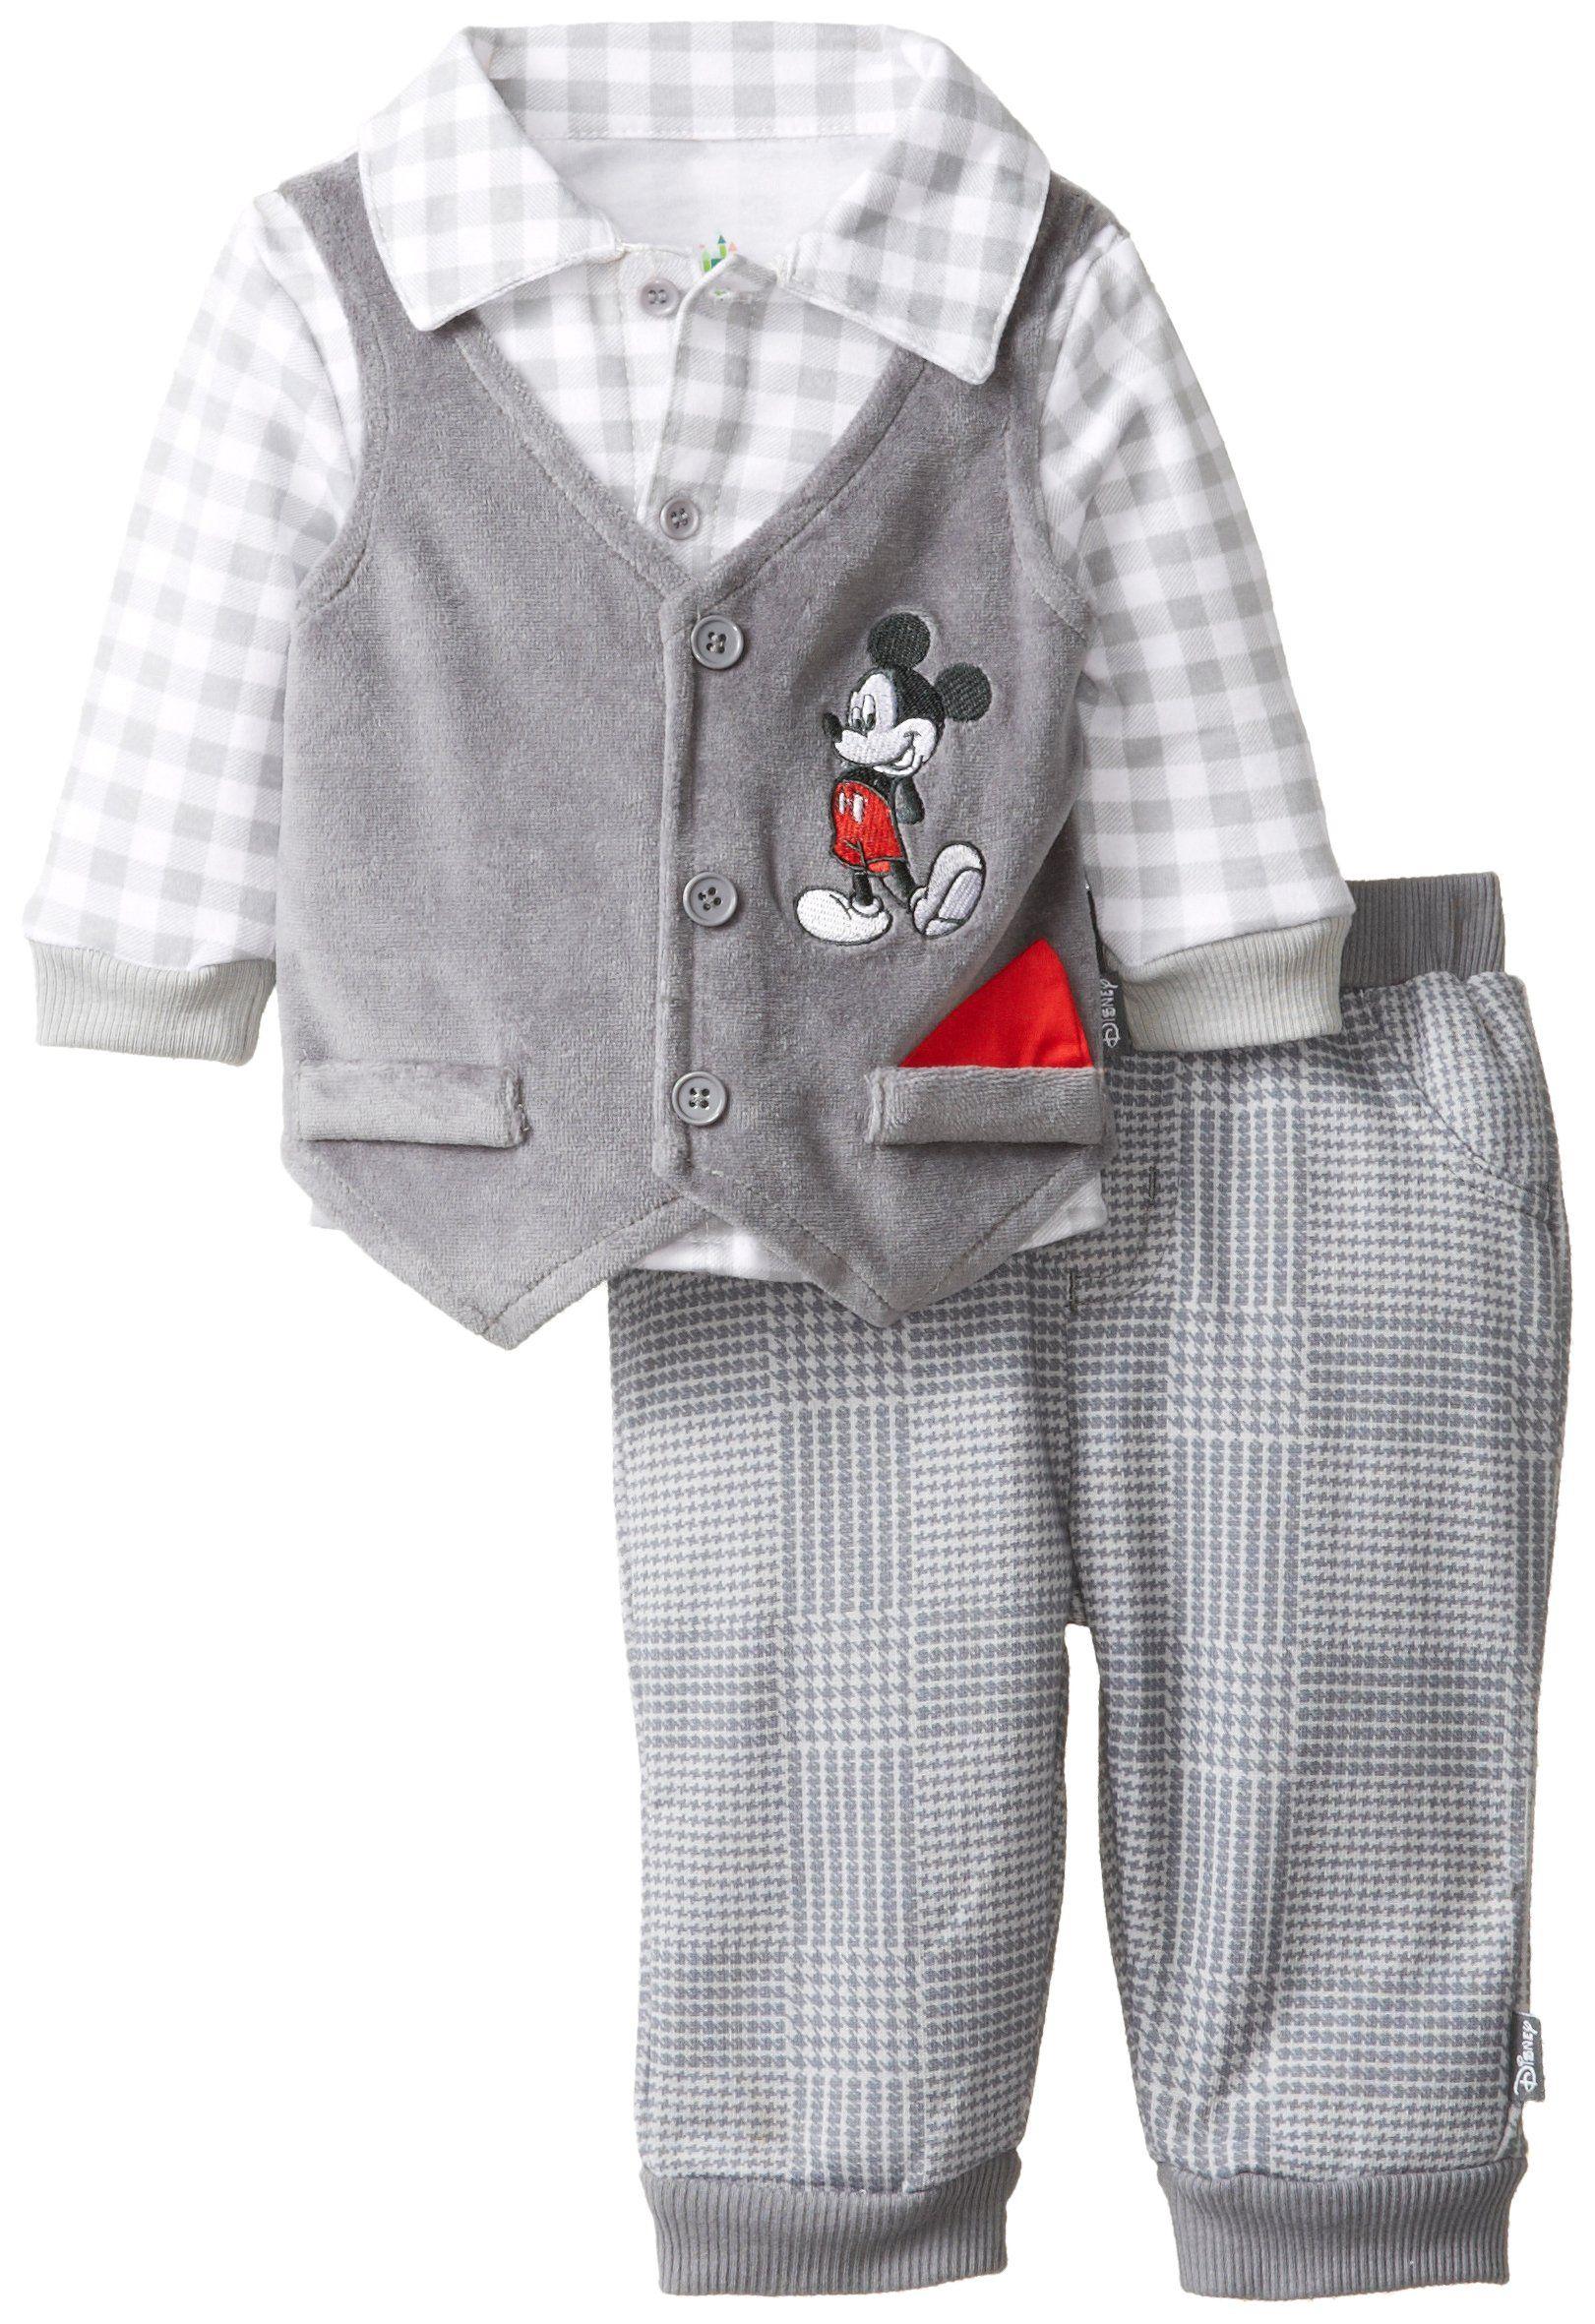 Disney Baby Boys Mickey Mouse 3 Piece Vest Set with